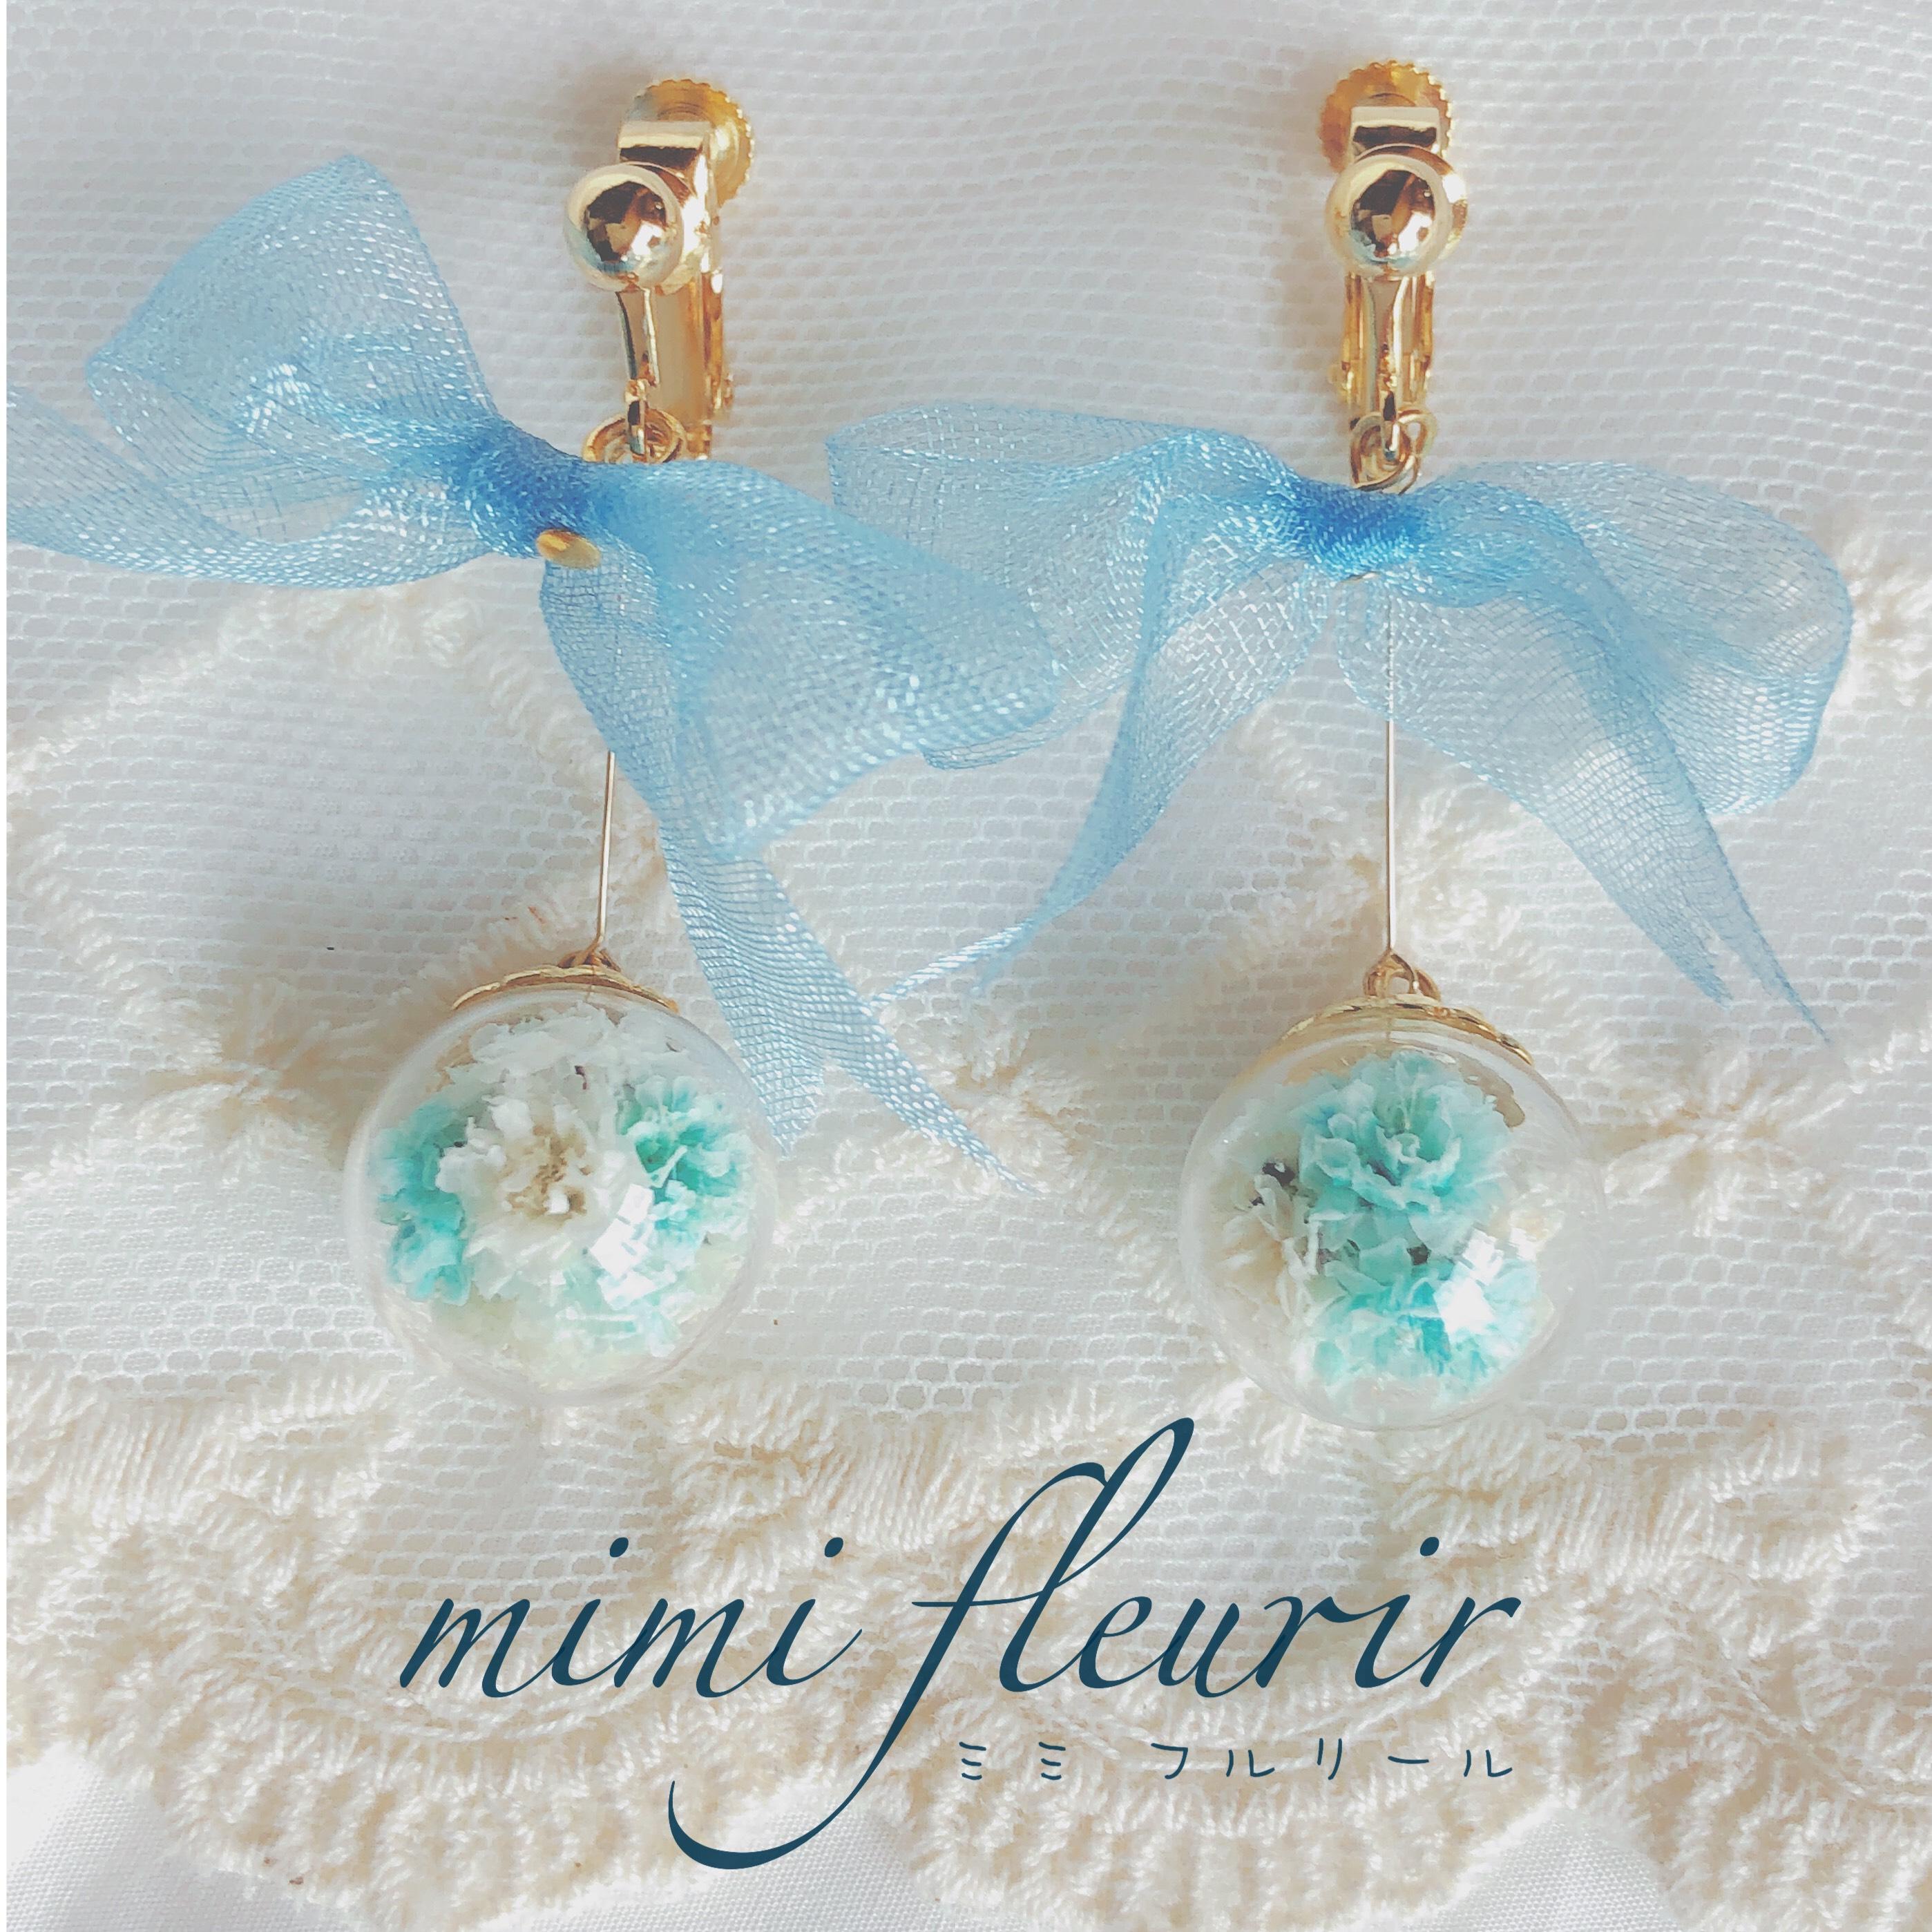 mimi fleurir